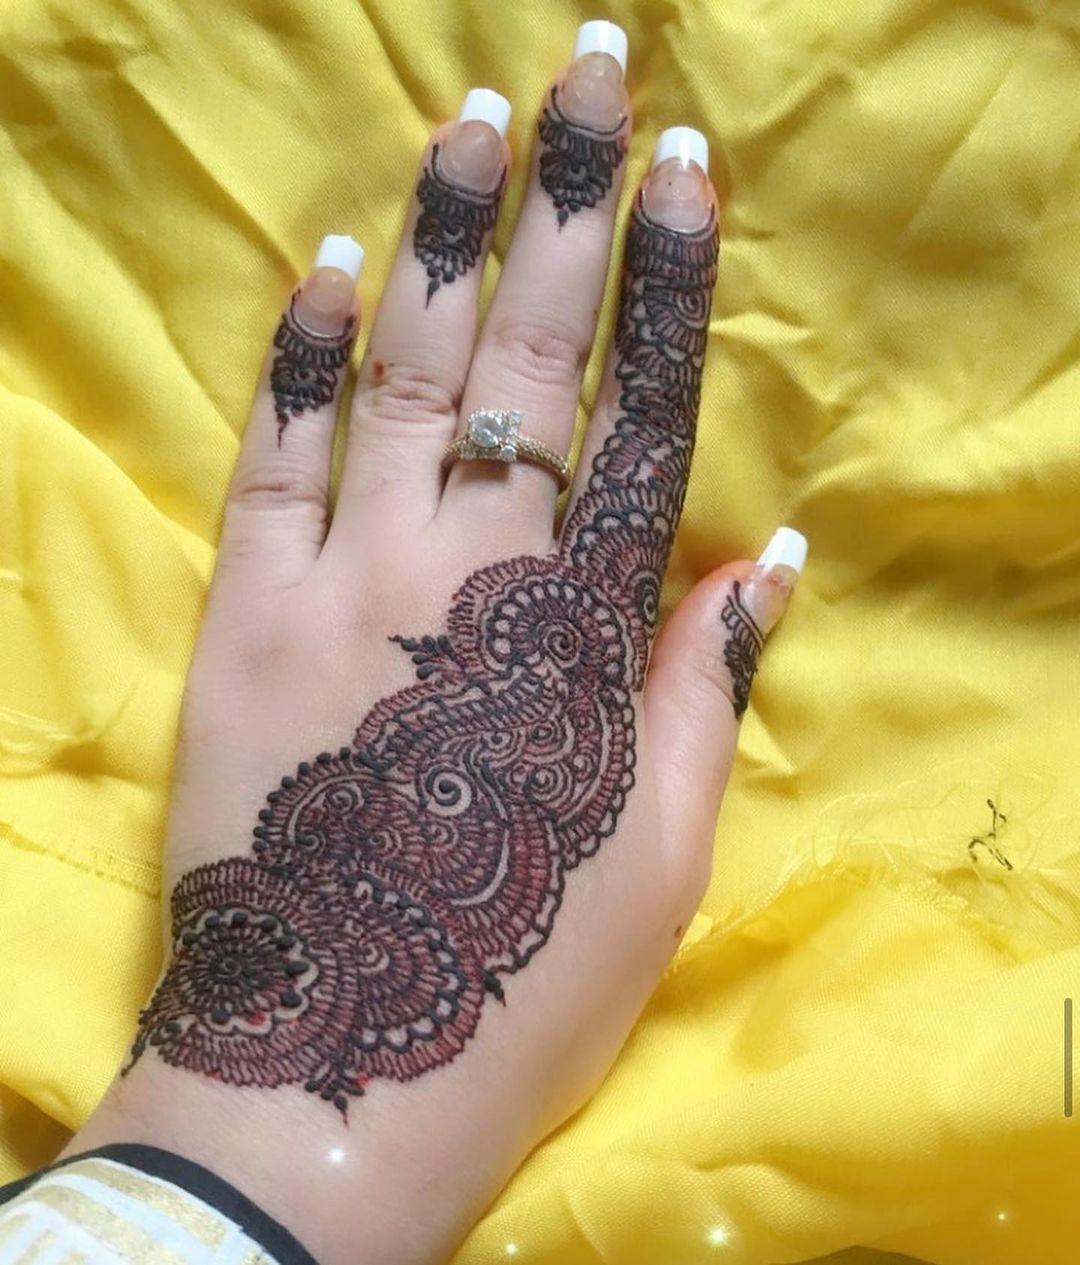 Red & Black Henna Hand Tattoo